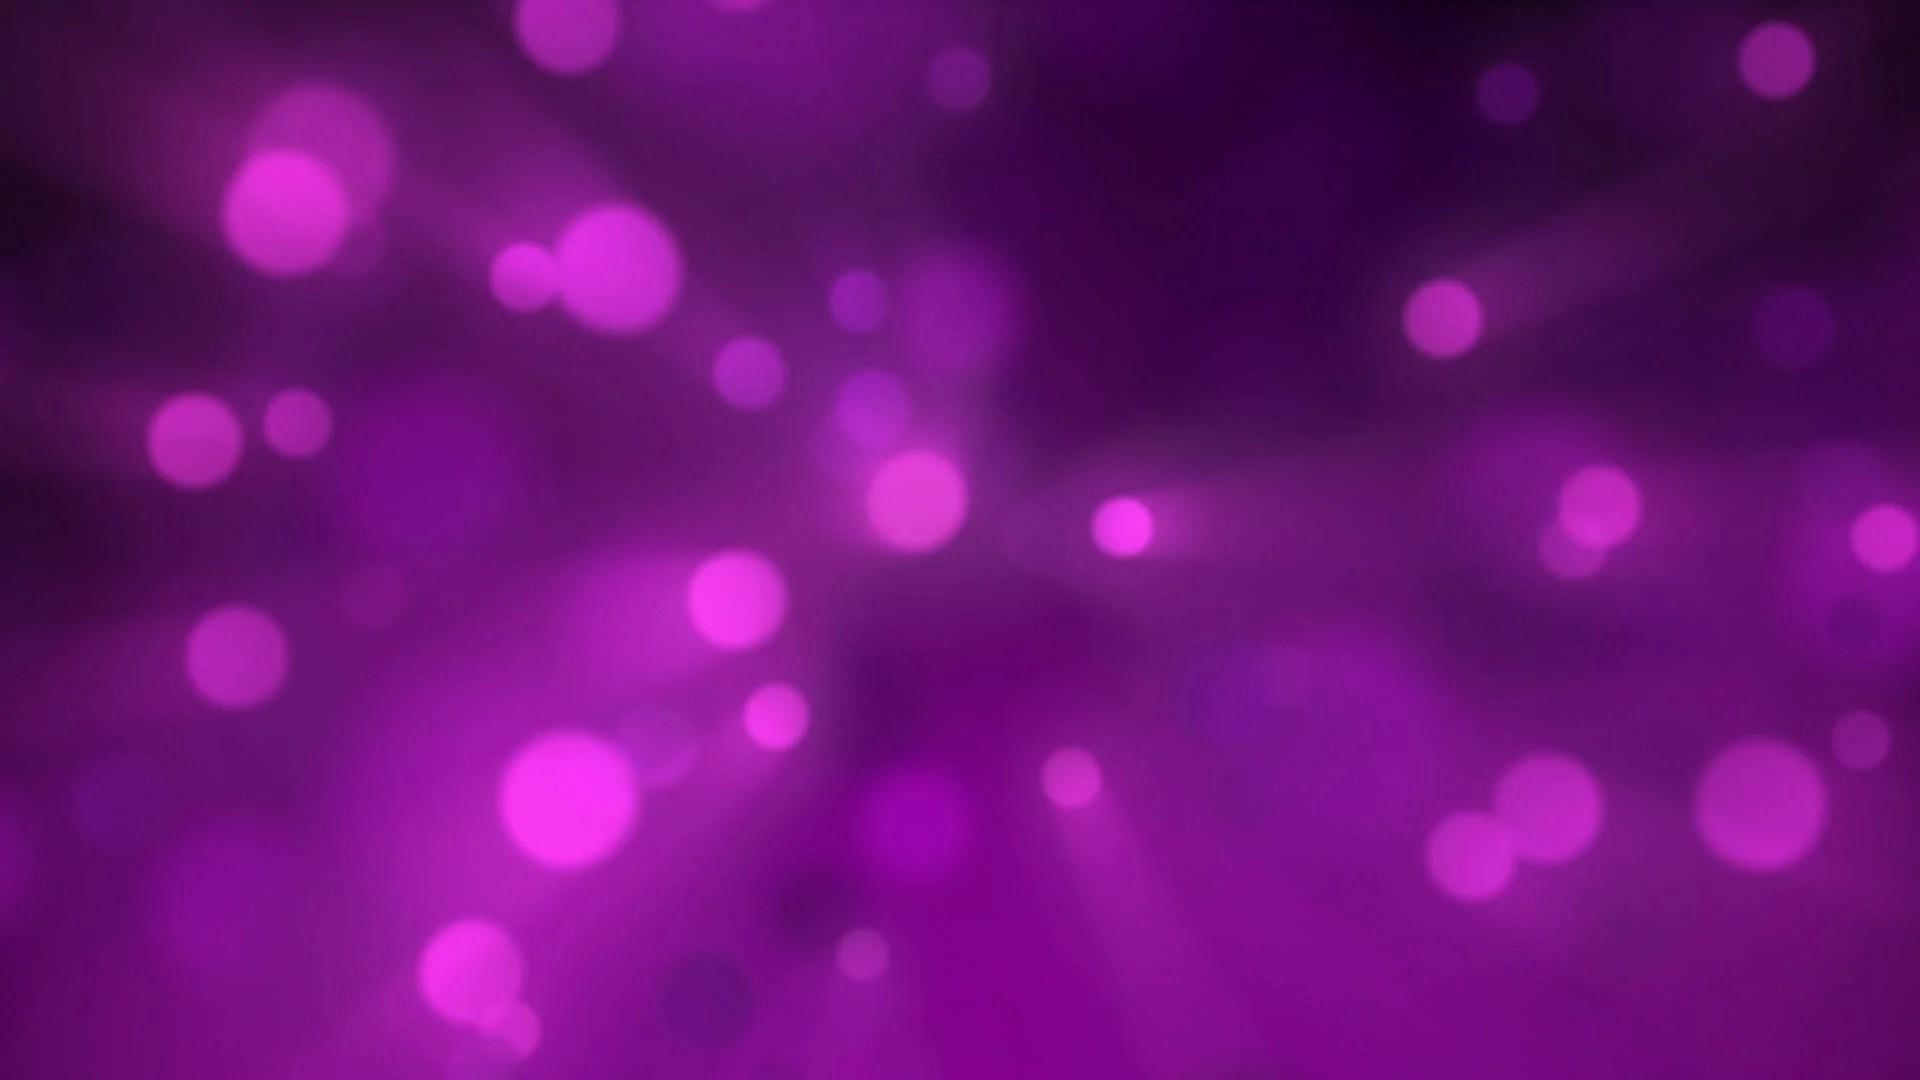 light particle background - purple ~ video clip #23029932